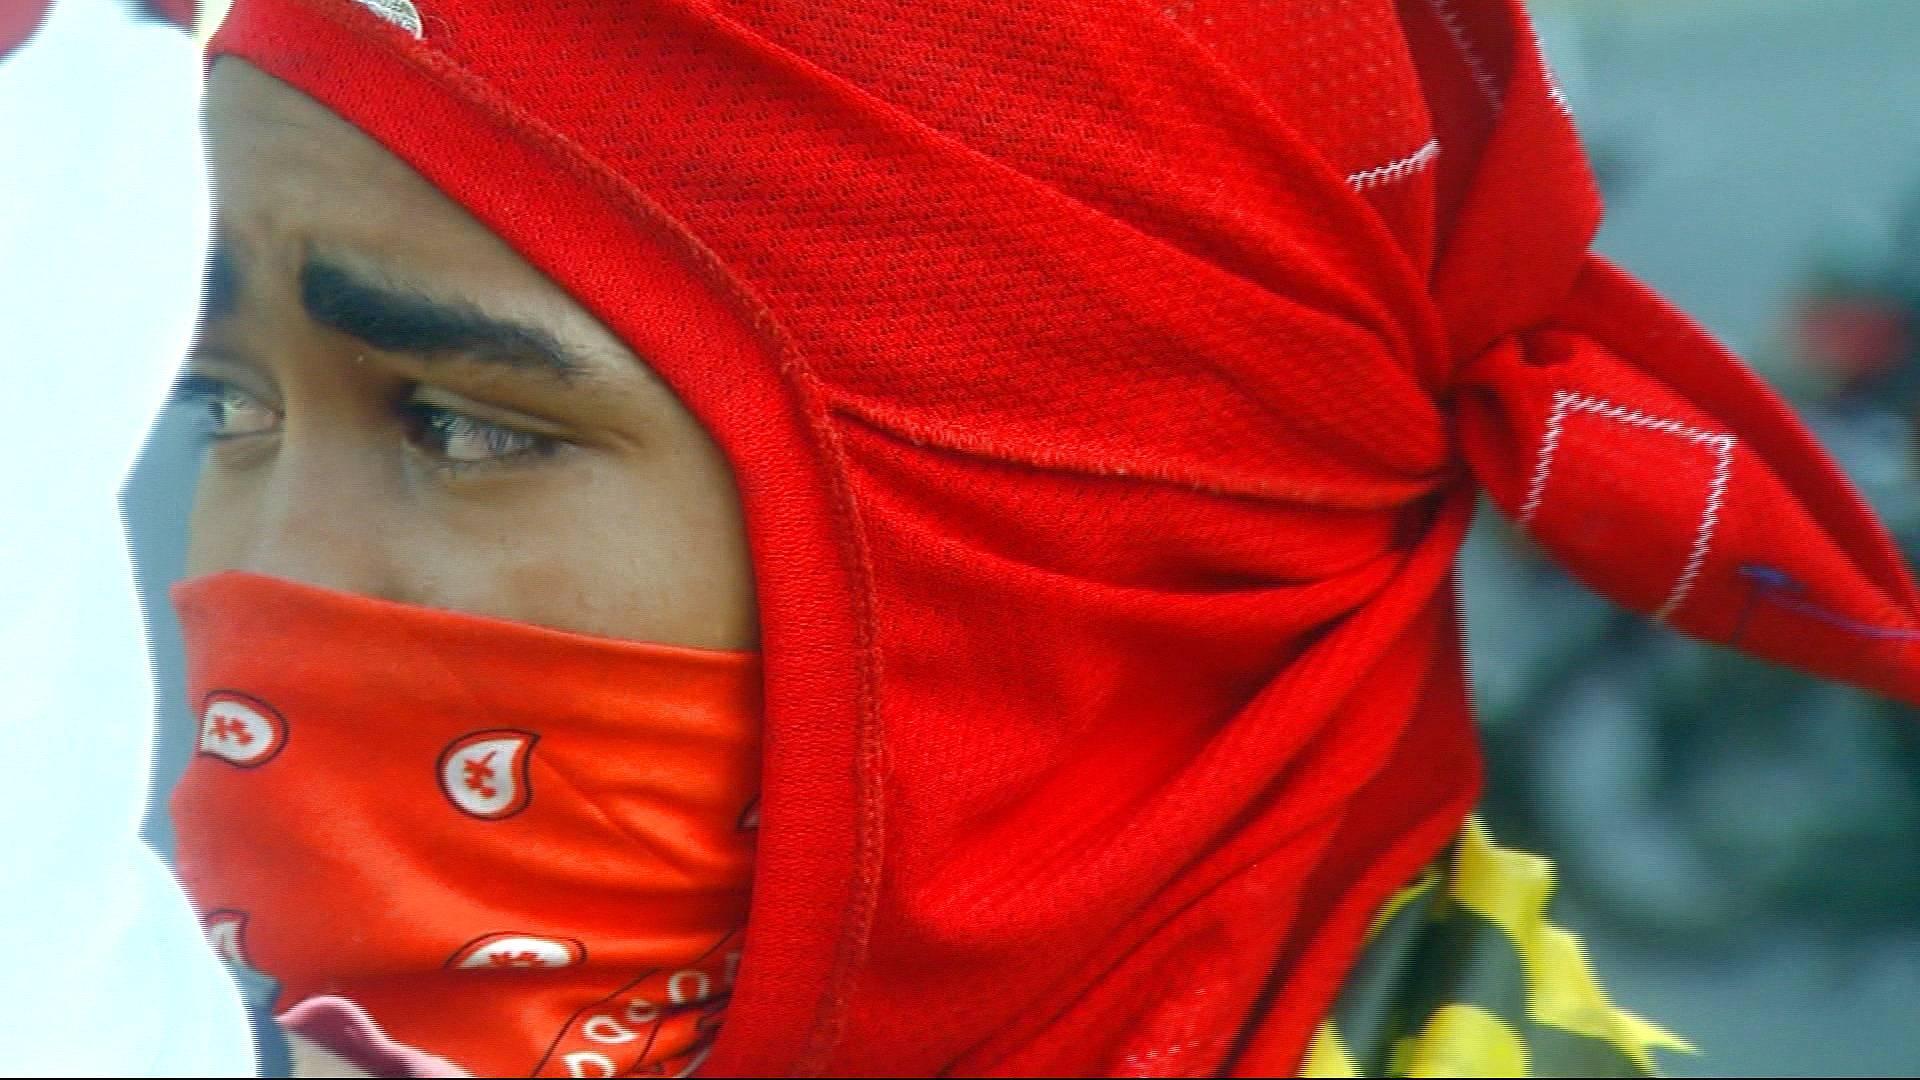 Venezuela: Violent protests continue into a third month